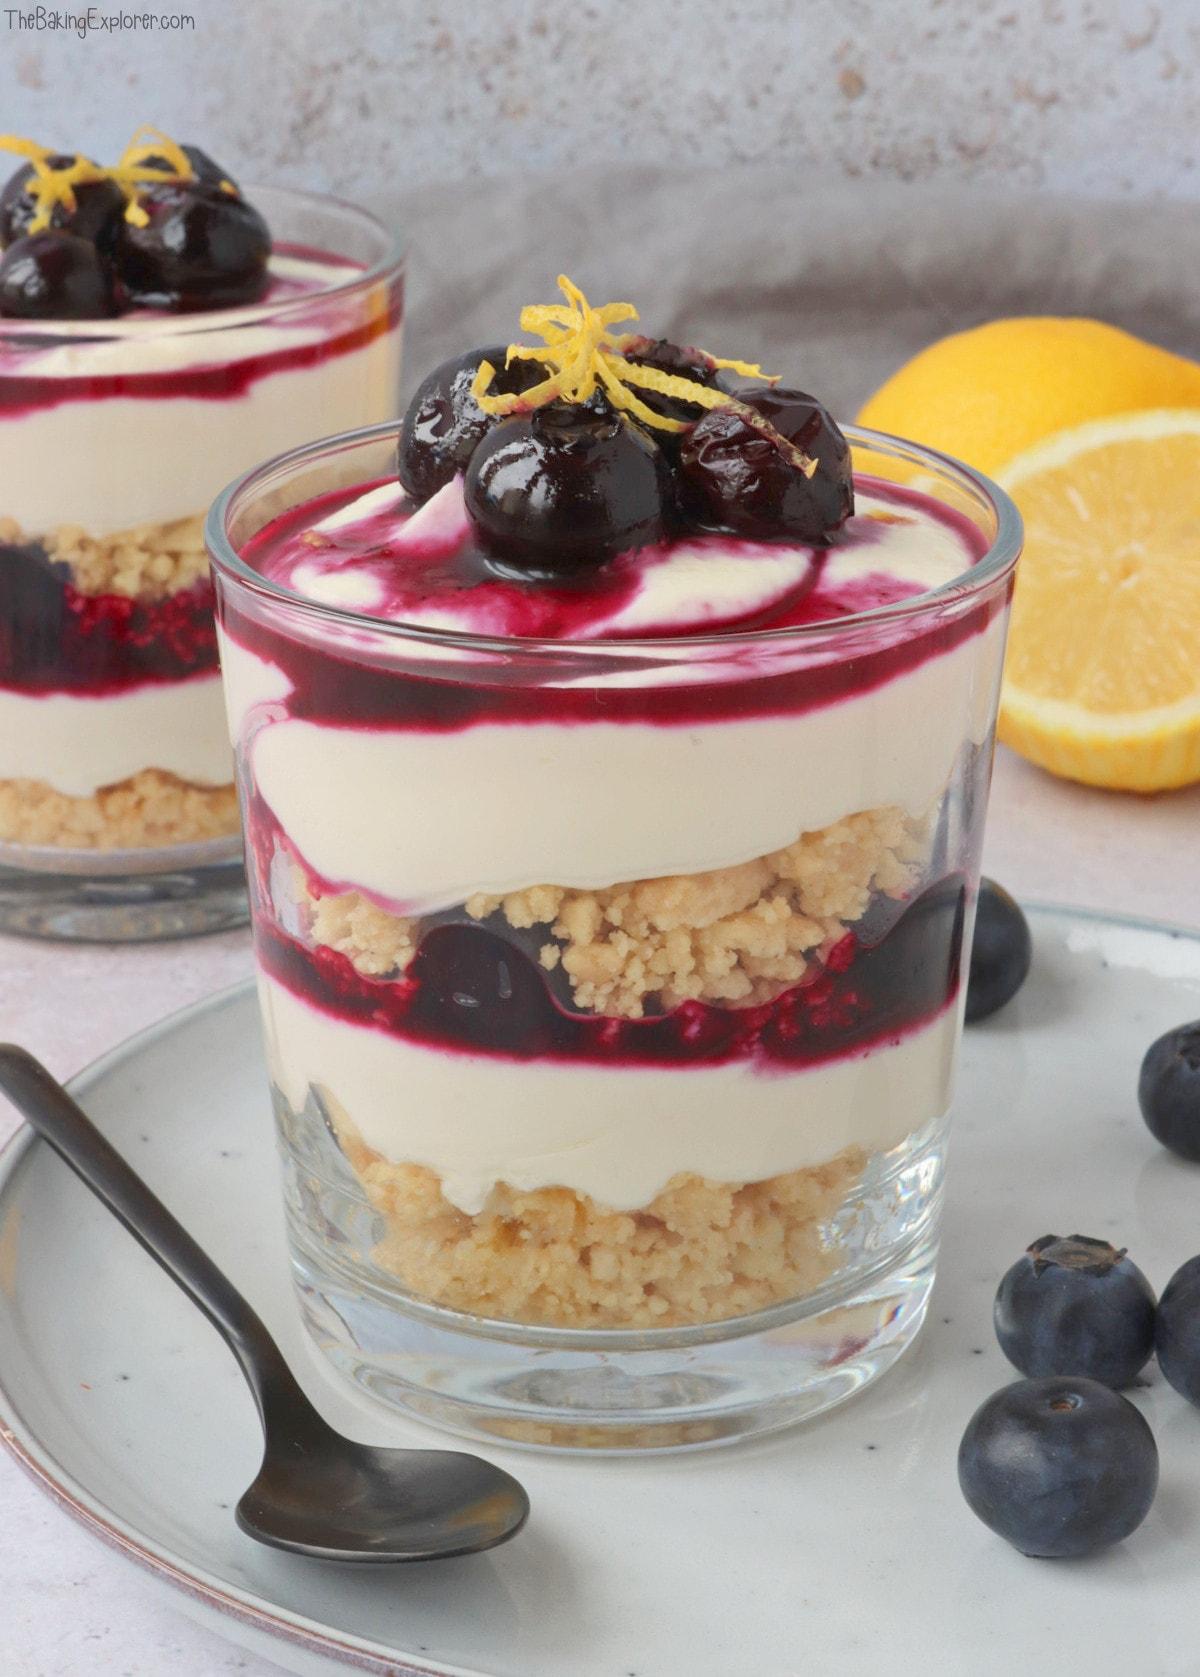 Lemon & Blueberry Dessert Pots